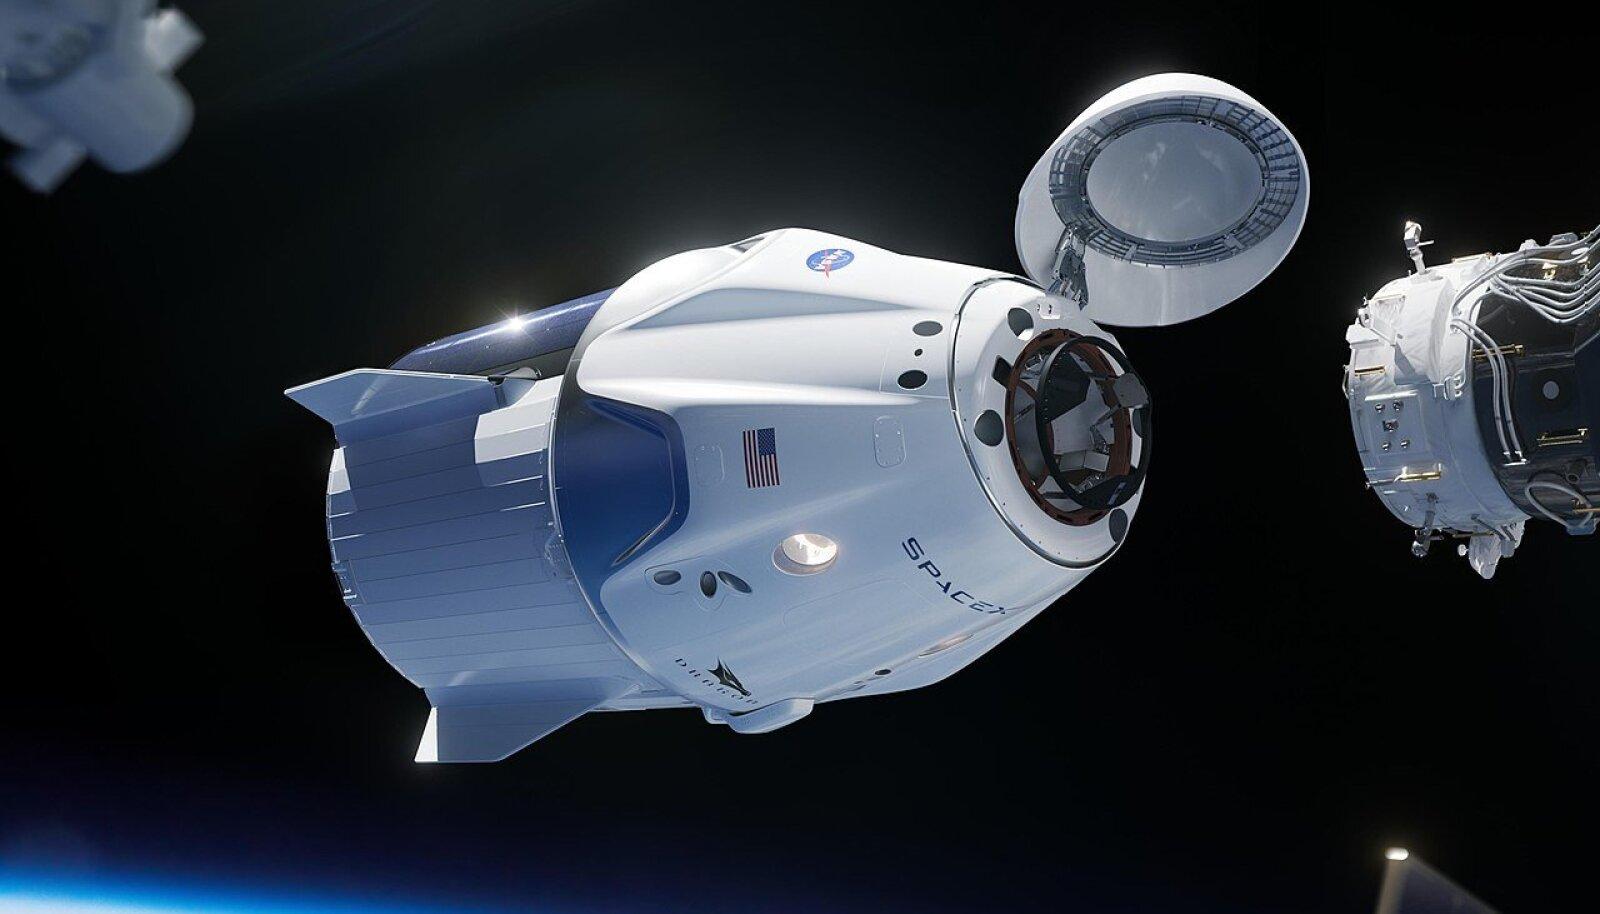 Crew Dragon valmistub ISS-iga ühendust looma (Foto: Wikimedia Commons / SpaceX, NASA)